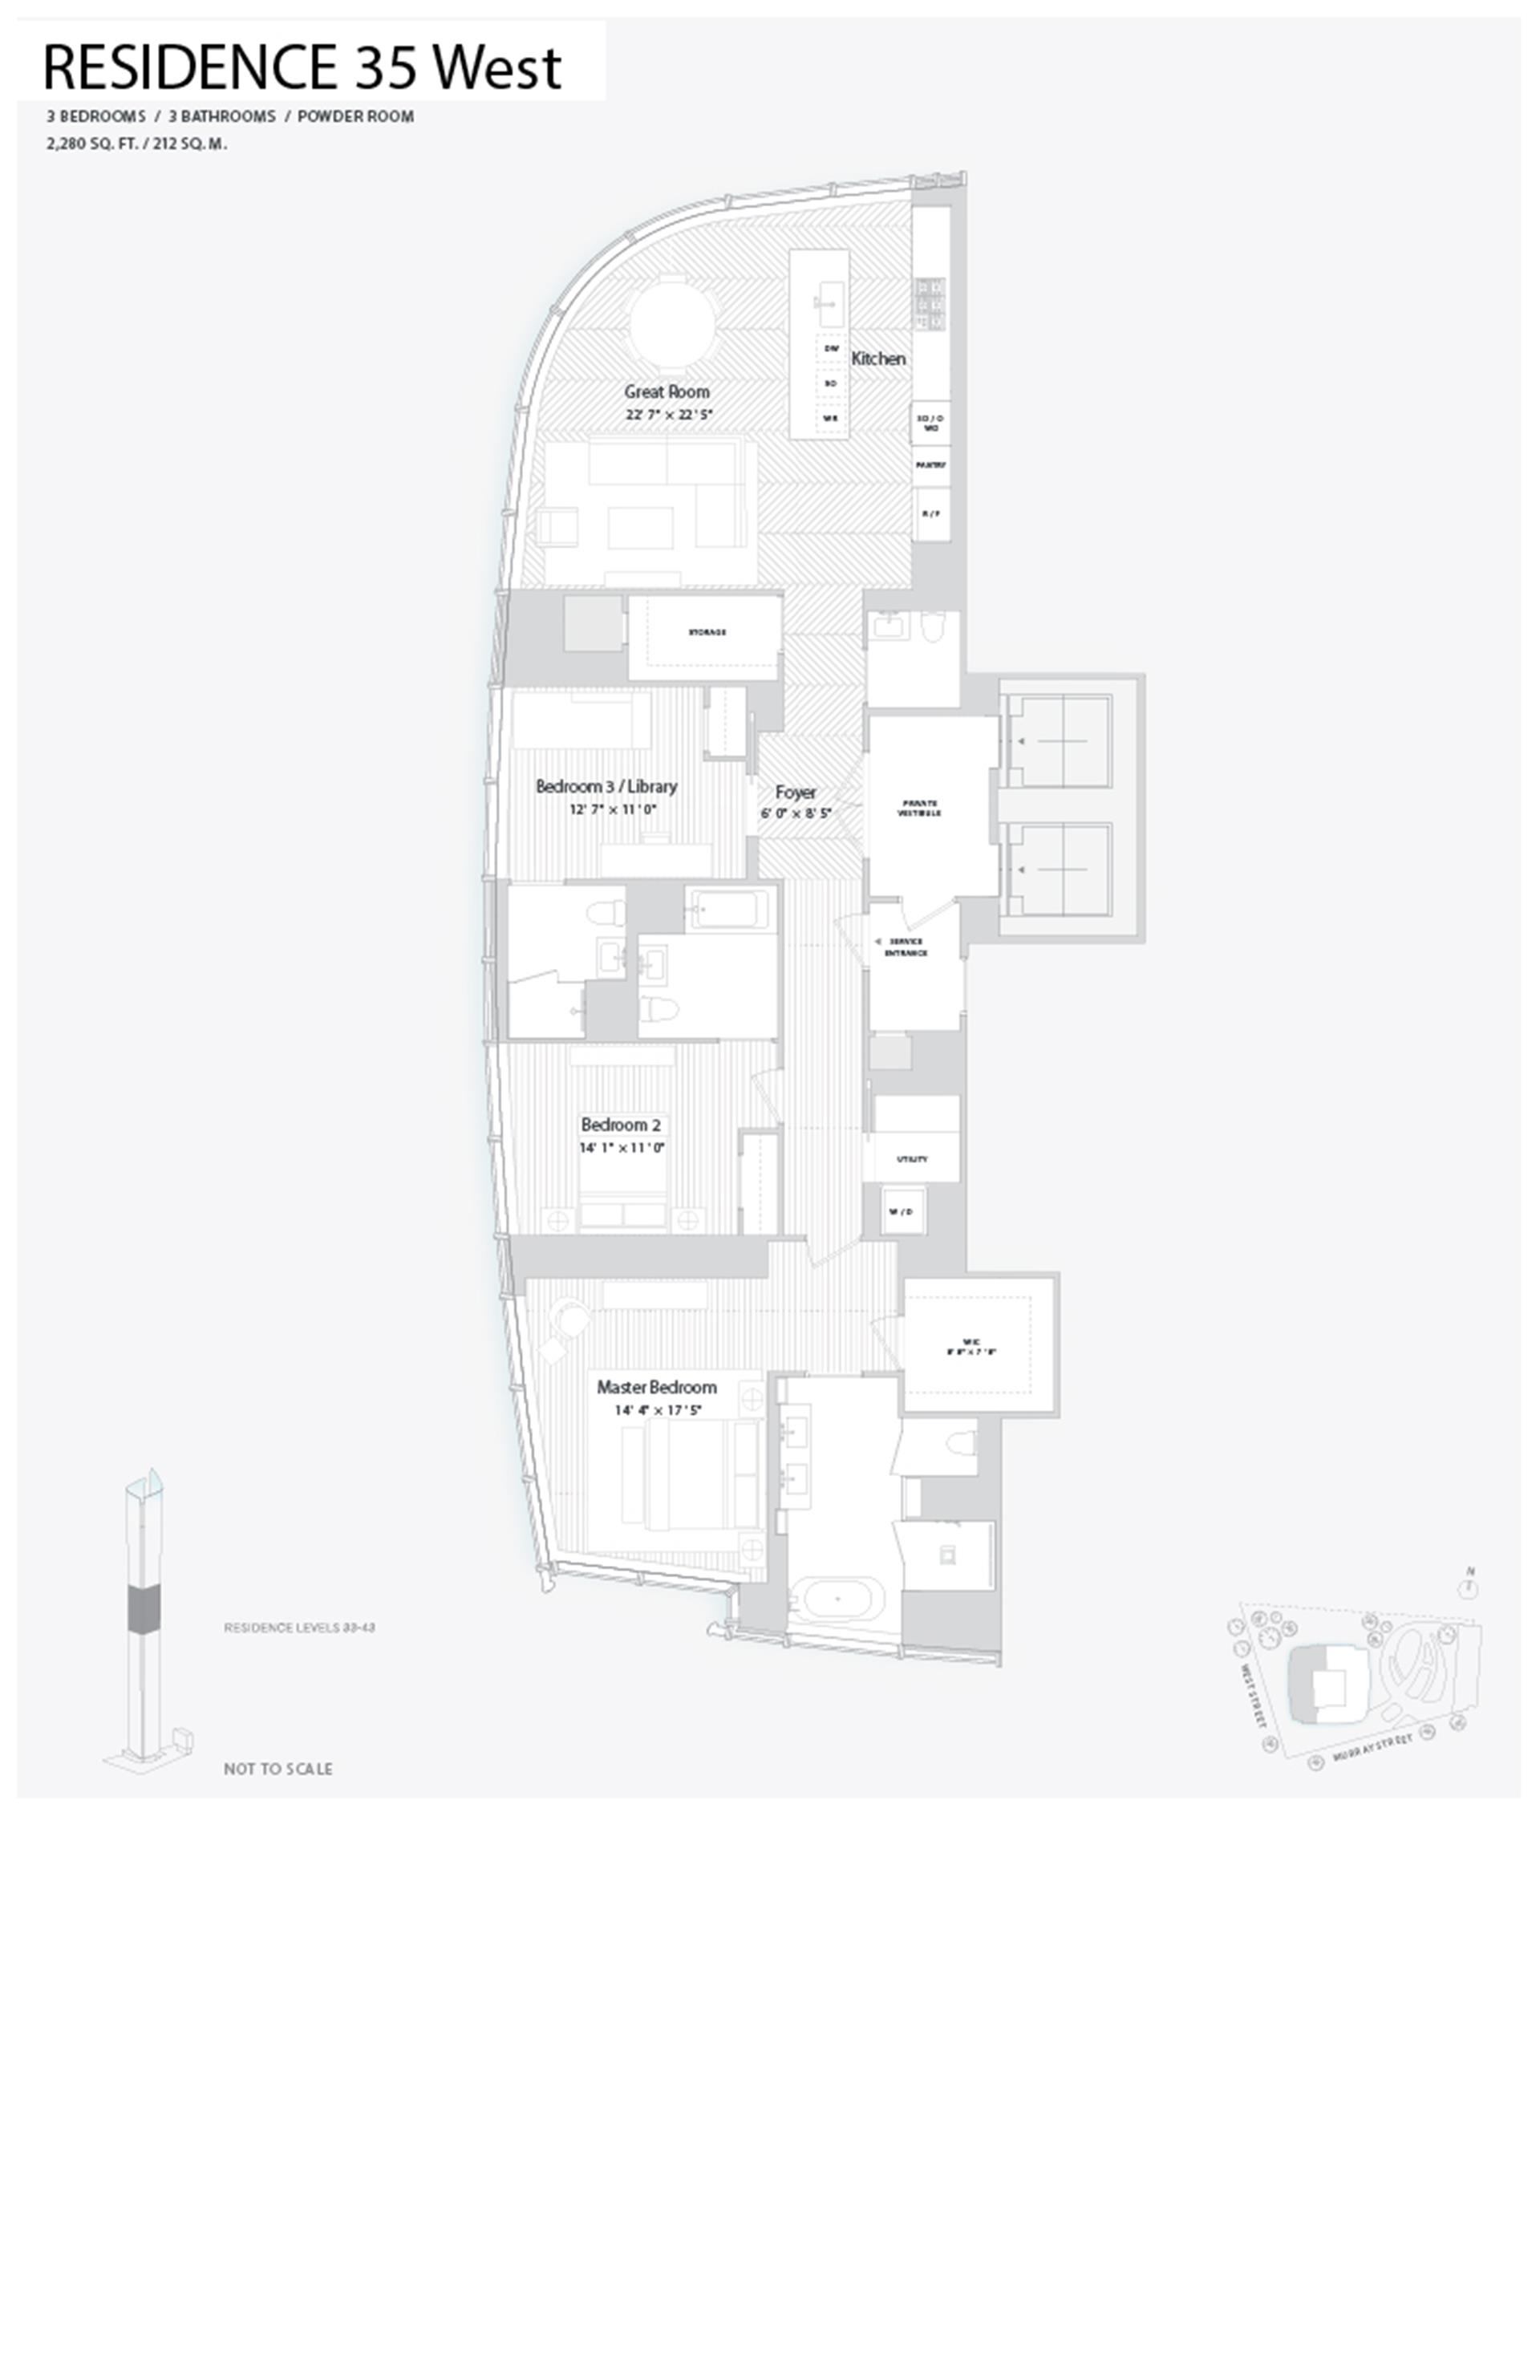 Floor plan of 111 Murray St, 35WEST - TriBeCa, New York